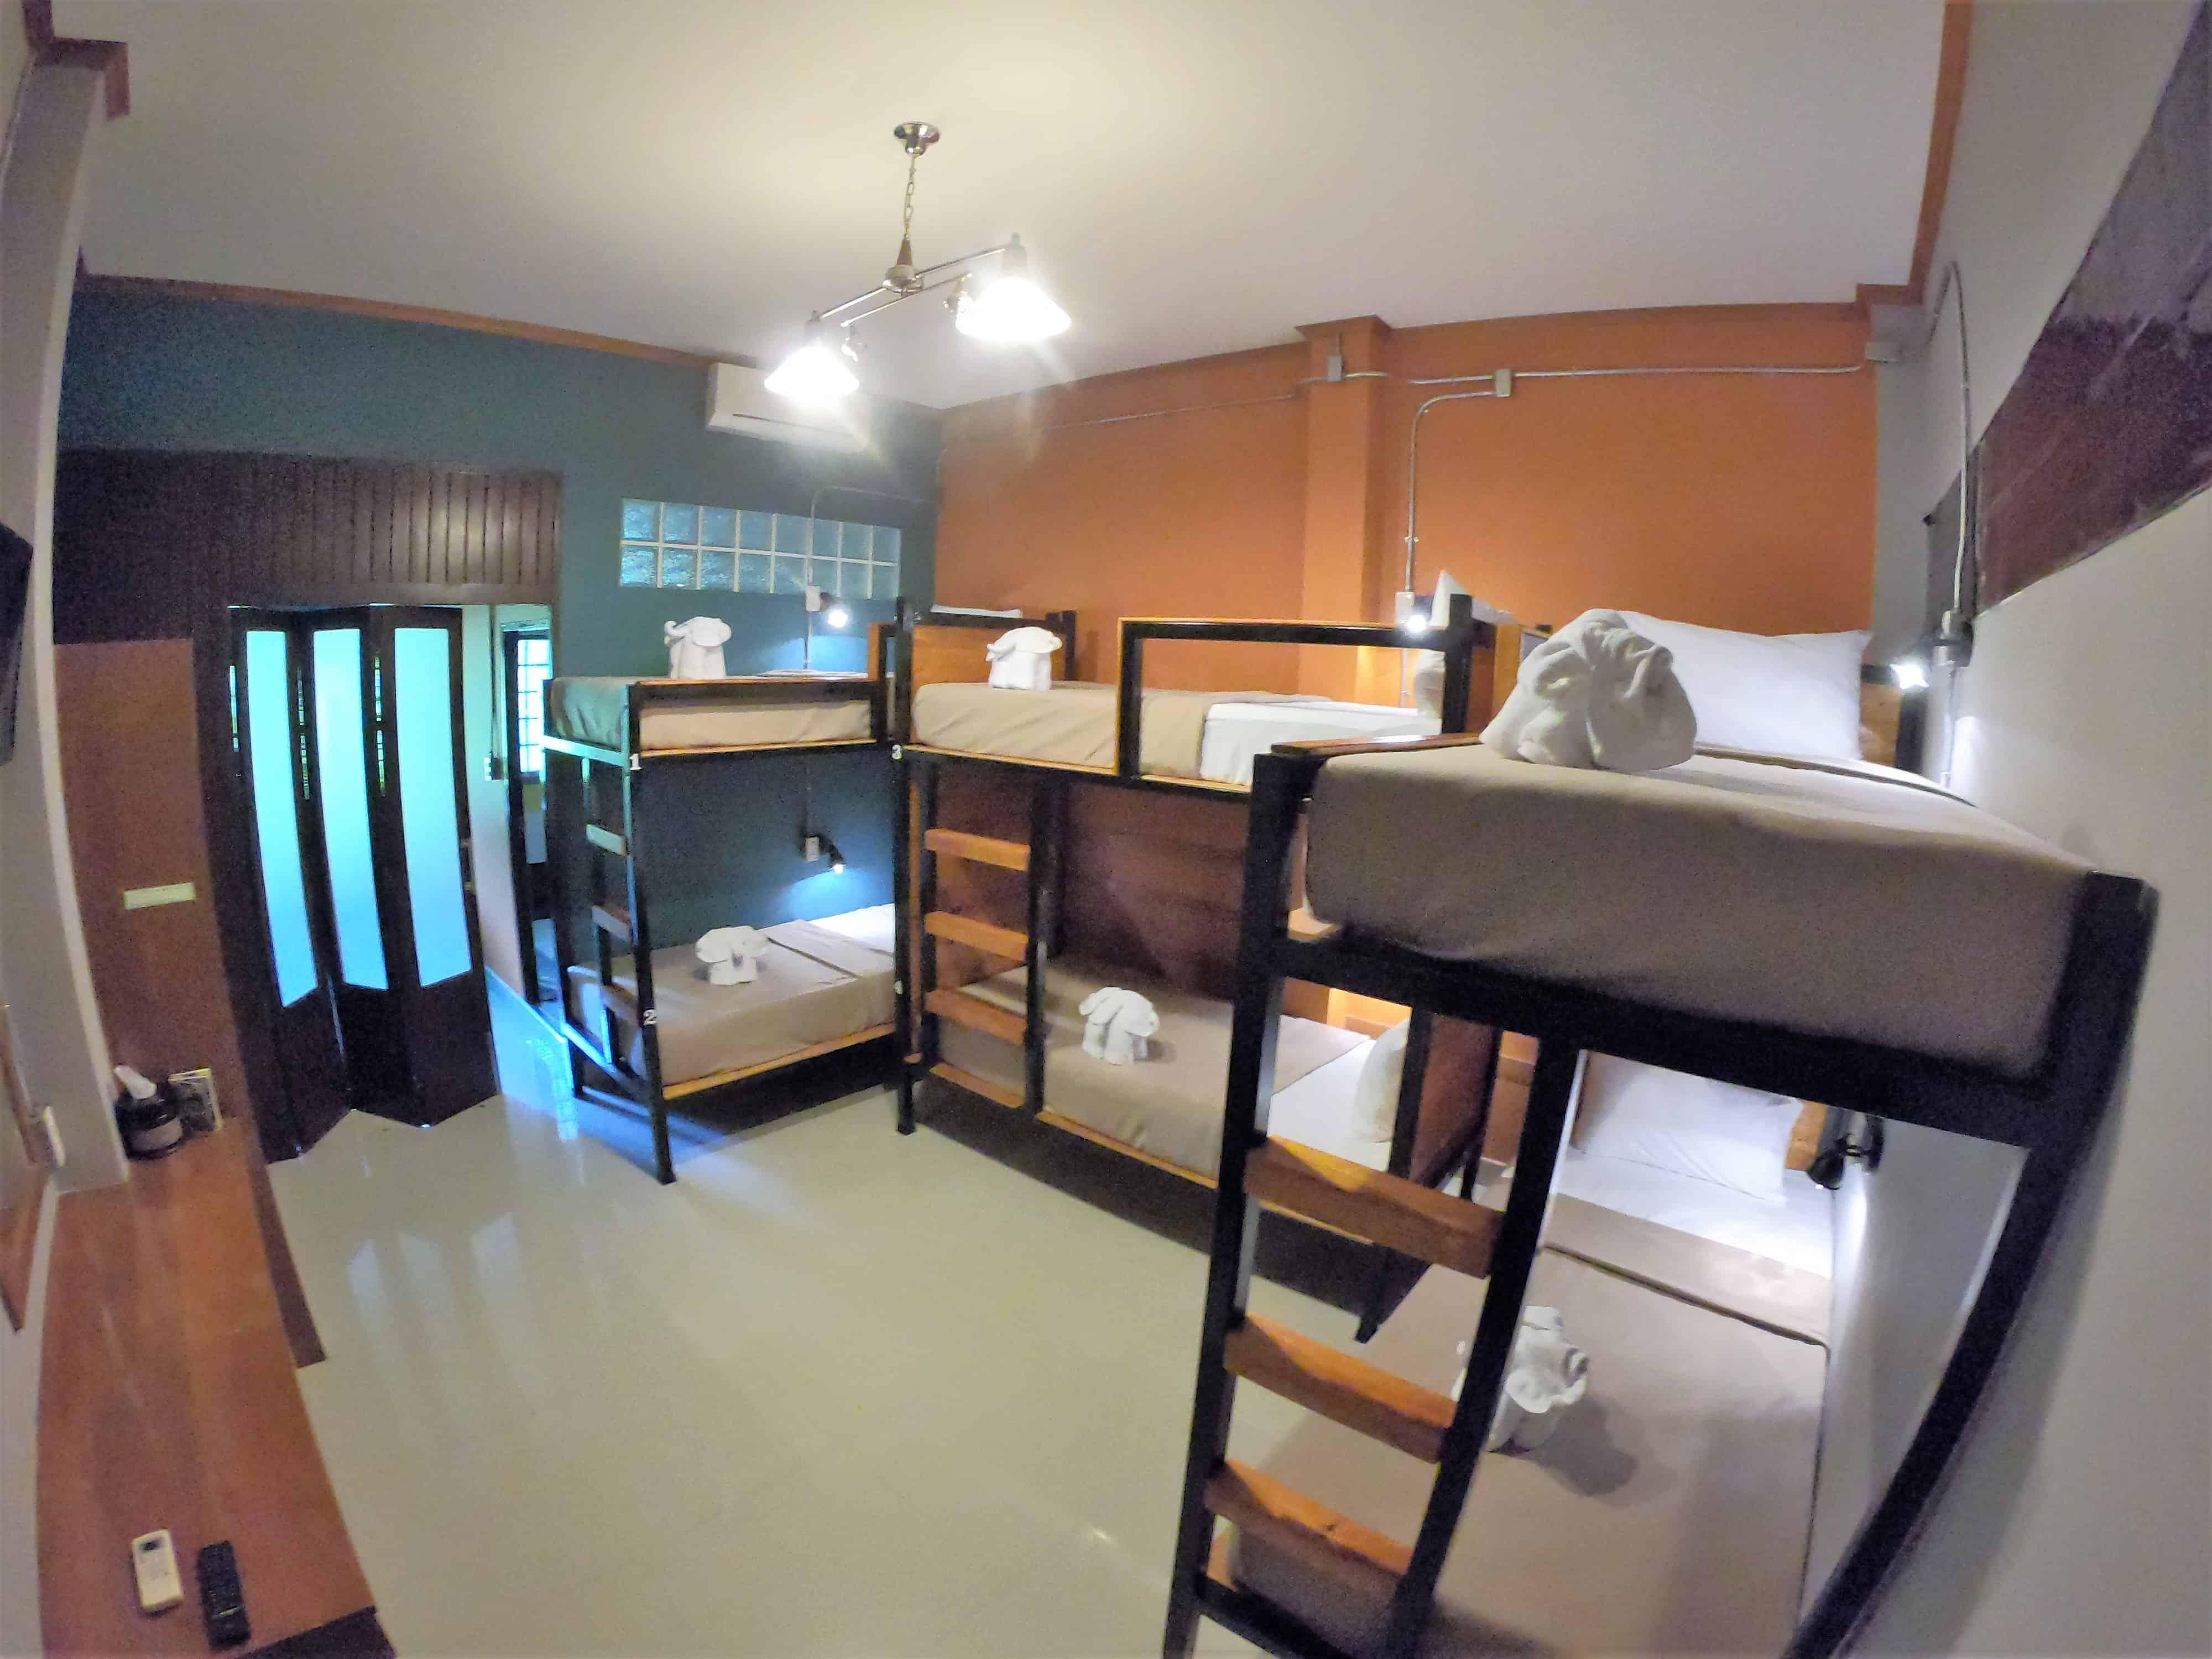 6 Bed Mixed Dorm (Poolside)